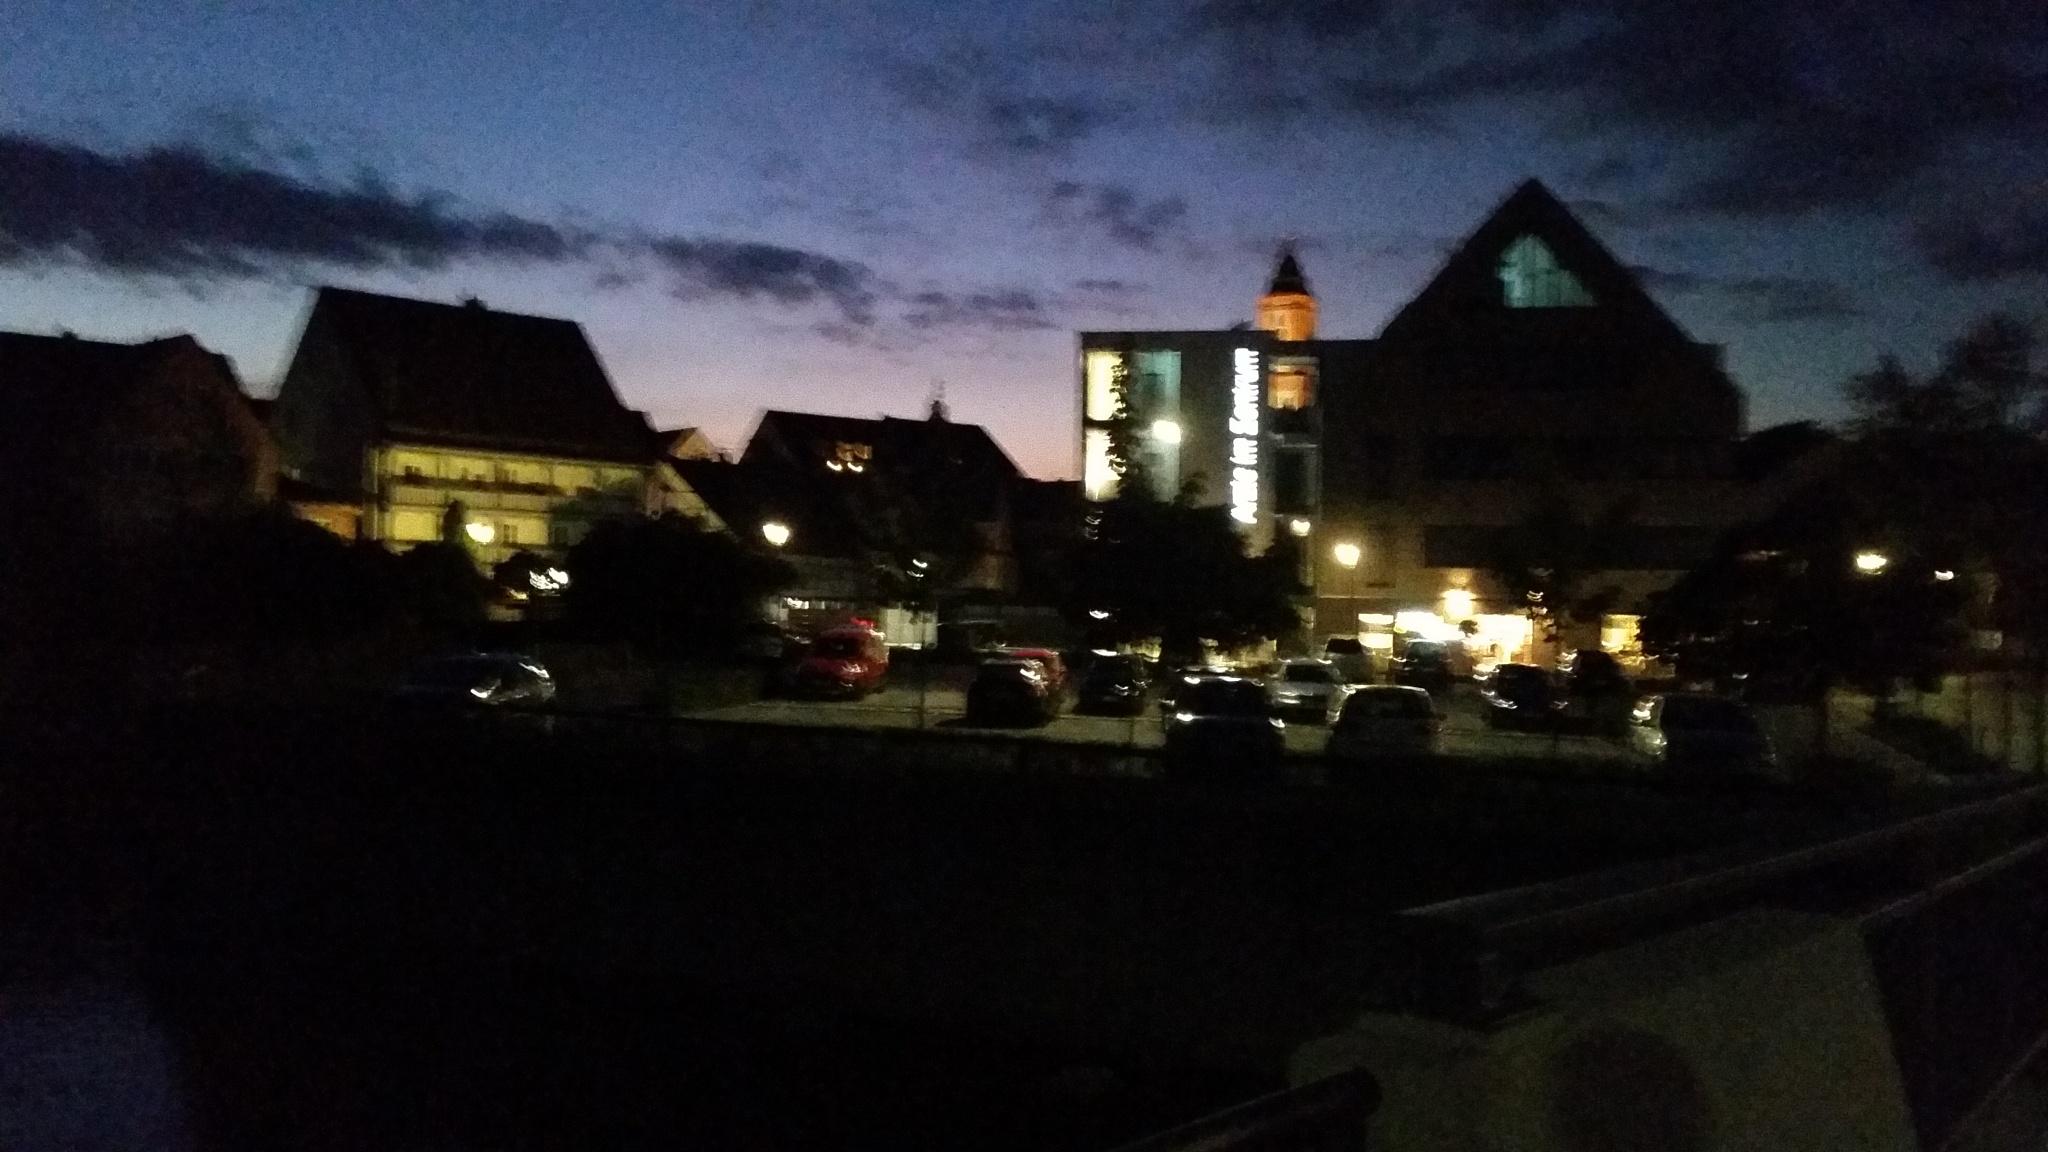 Krumbach city by djbluelime